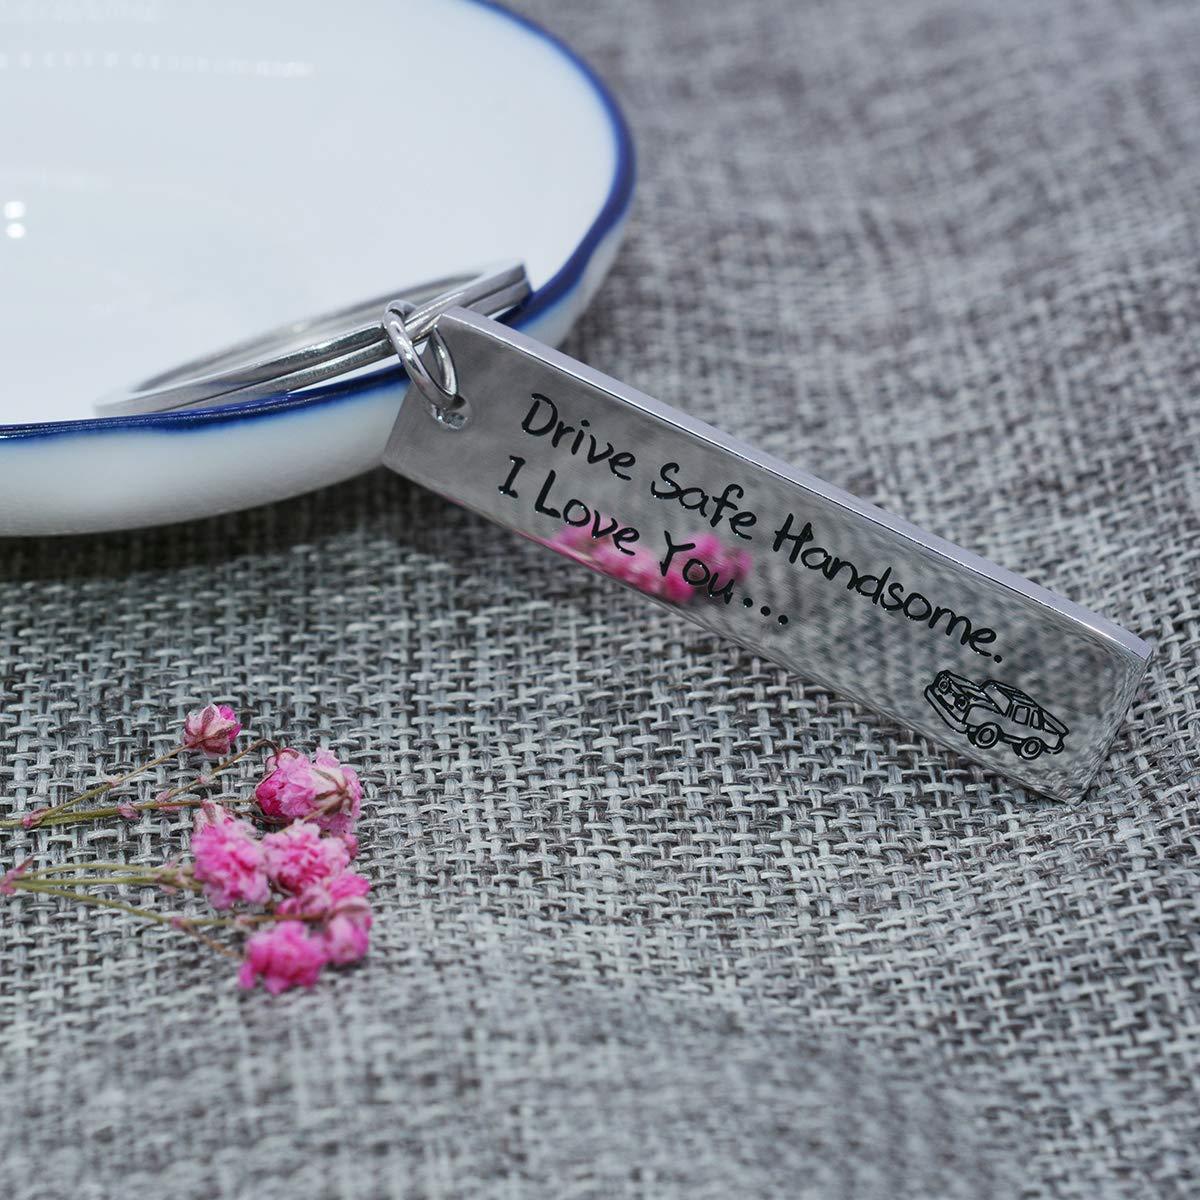 omodofo Drive Safe Ride Safe Travel Safe Trip Rectangle Key Chain for Trucker Boyfriend Girlfriend Couple Christams Gift